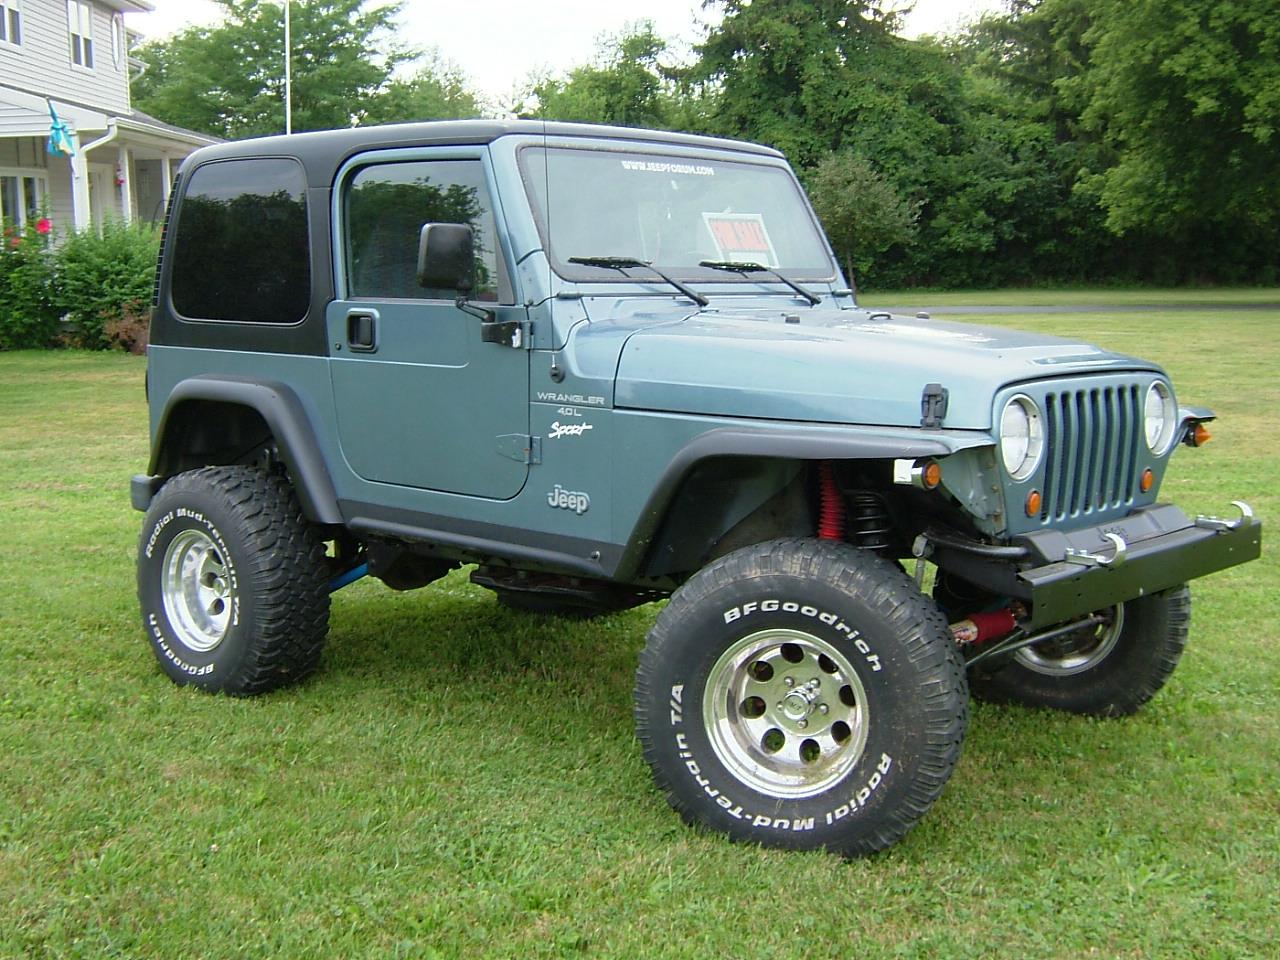 Open Jeep Images Download >> 1998 Jeep Wrangler - Partsopen